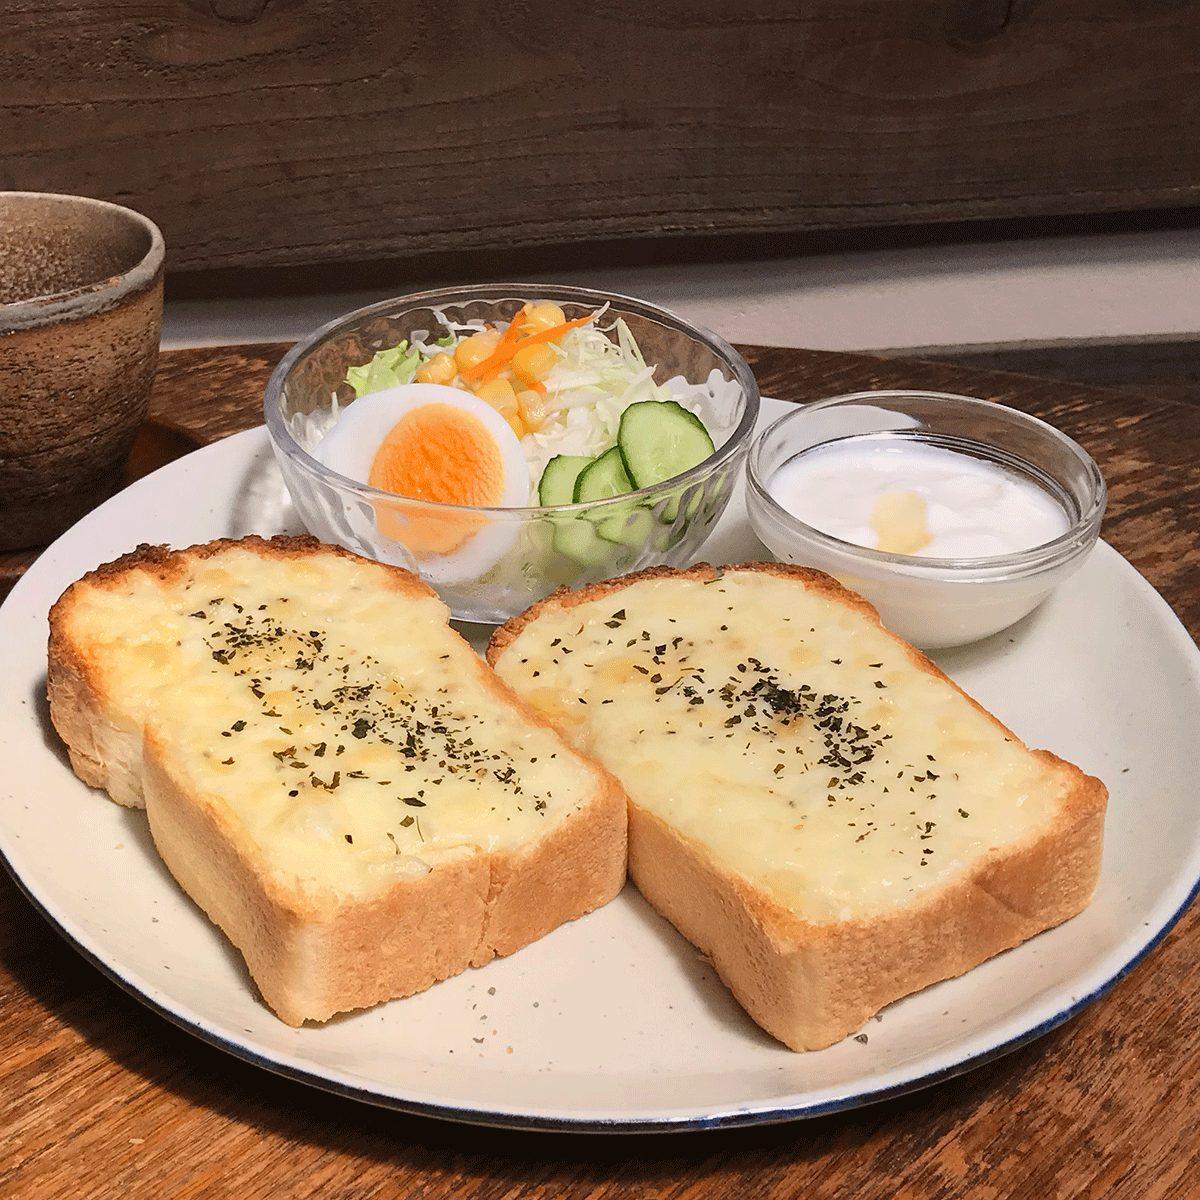 Usaboku's Breakfast: Cheese toast set